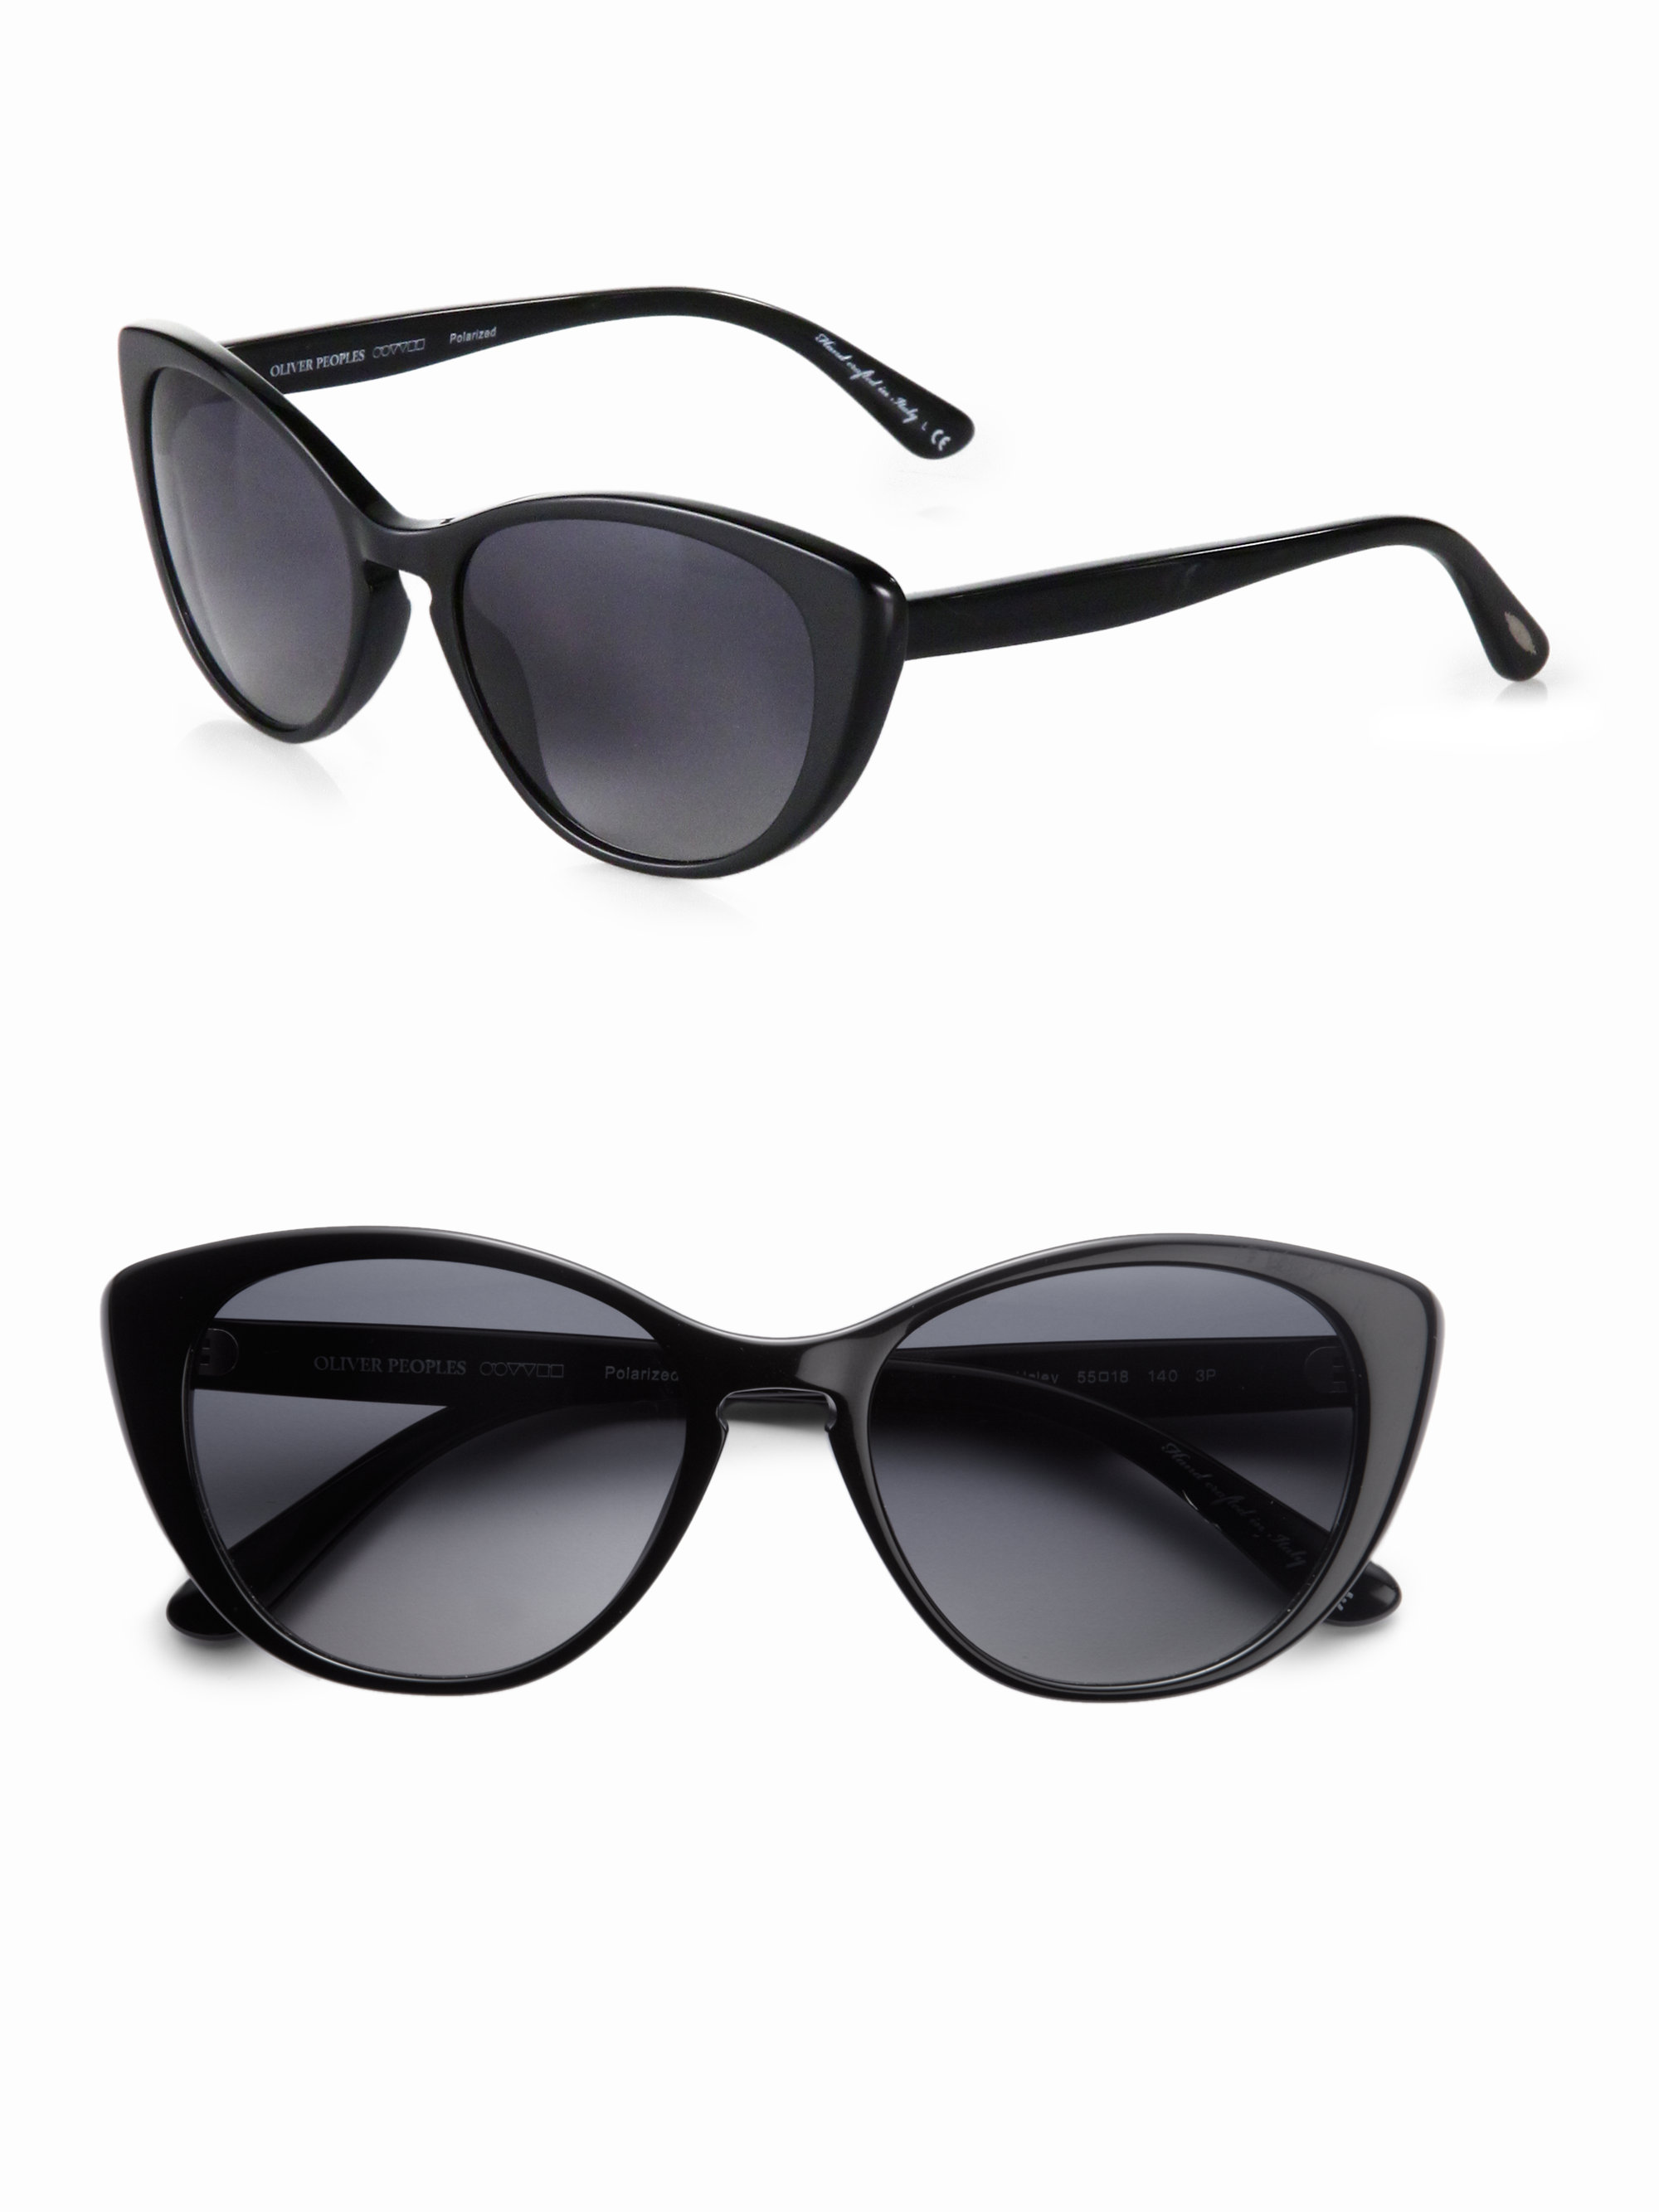 ad1443f5d422e Oliver Peoples Cateye Glasses - Best Glasses Cnapracticetesting.Com 2018